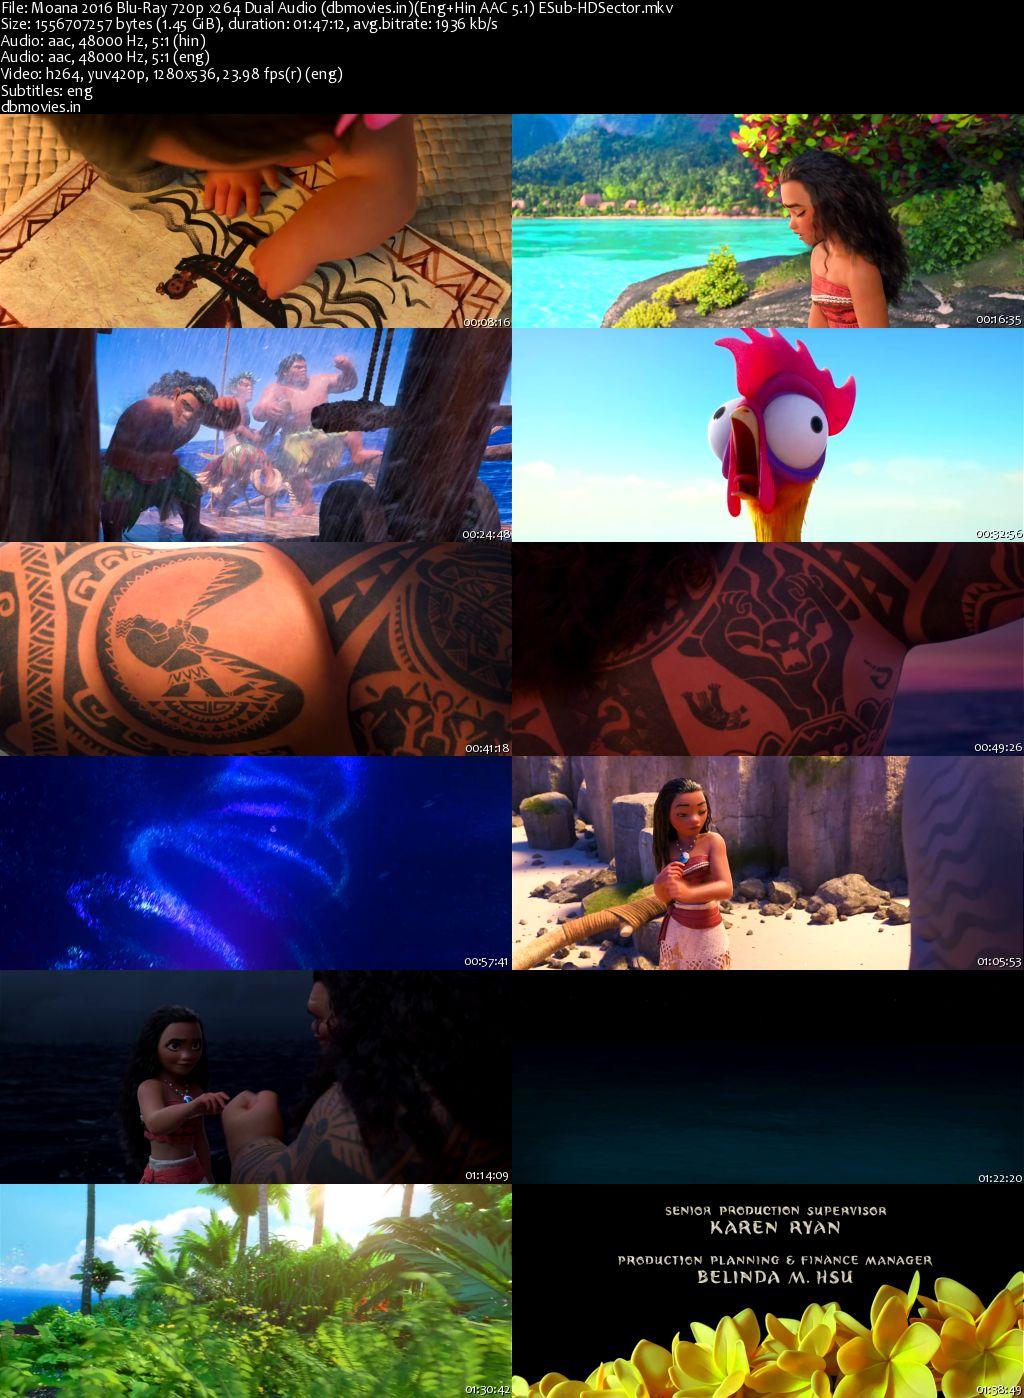 screen shot Moana 2016 Full Movie Download Dual Audio 720p